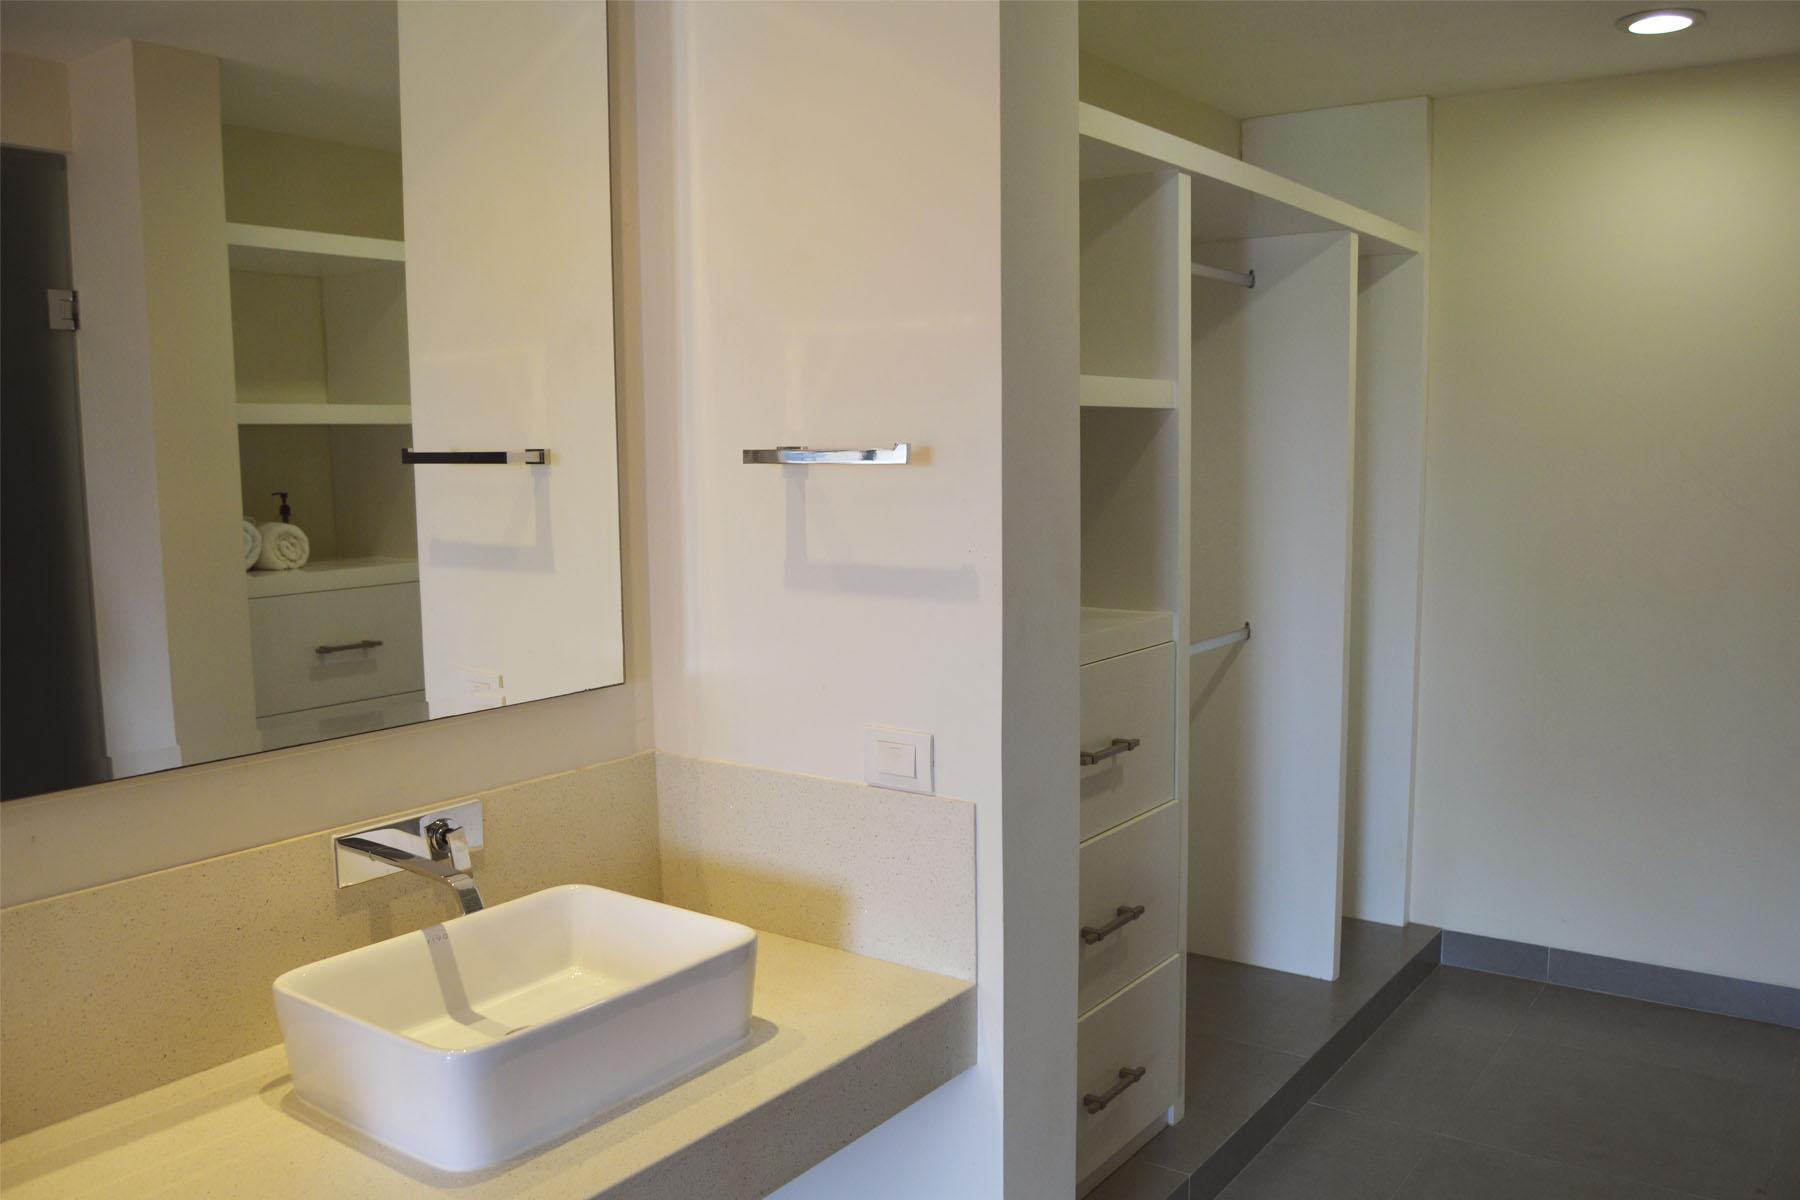 Additional photo for property listing at DIAMANTE BLANCO CONDOMINIO DE LUJO Nick Price Lote 79, Mza 21, Region 04 Playa Del Carmen, Quintana Roo 77710 México